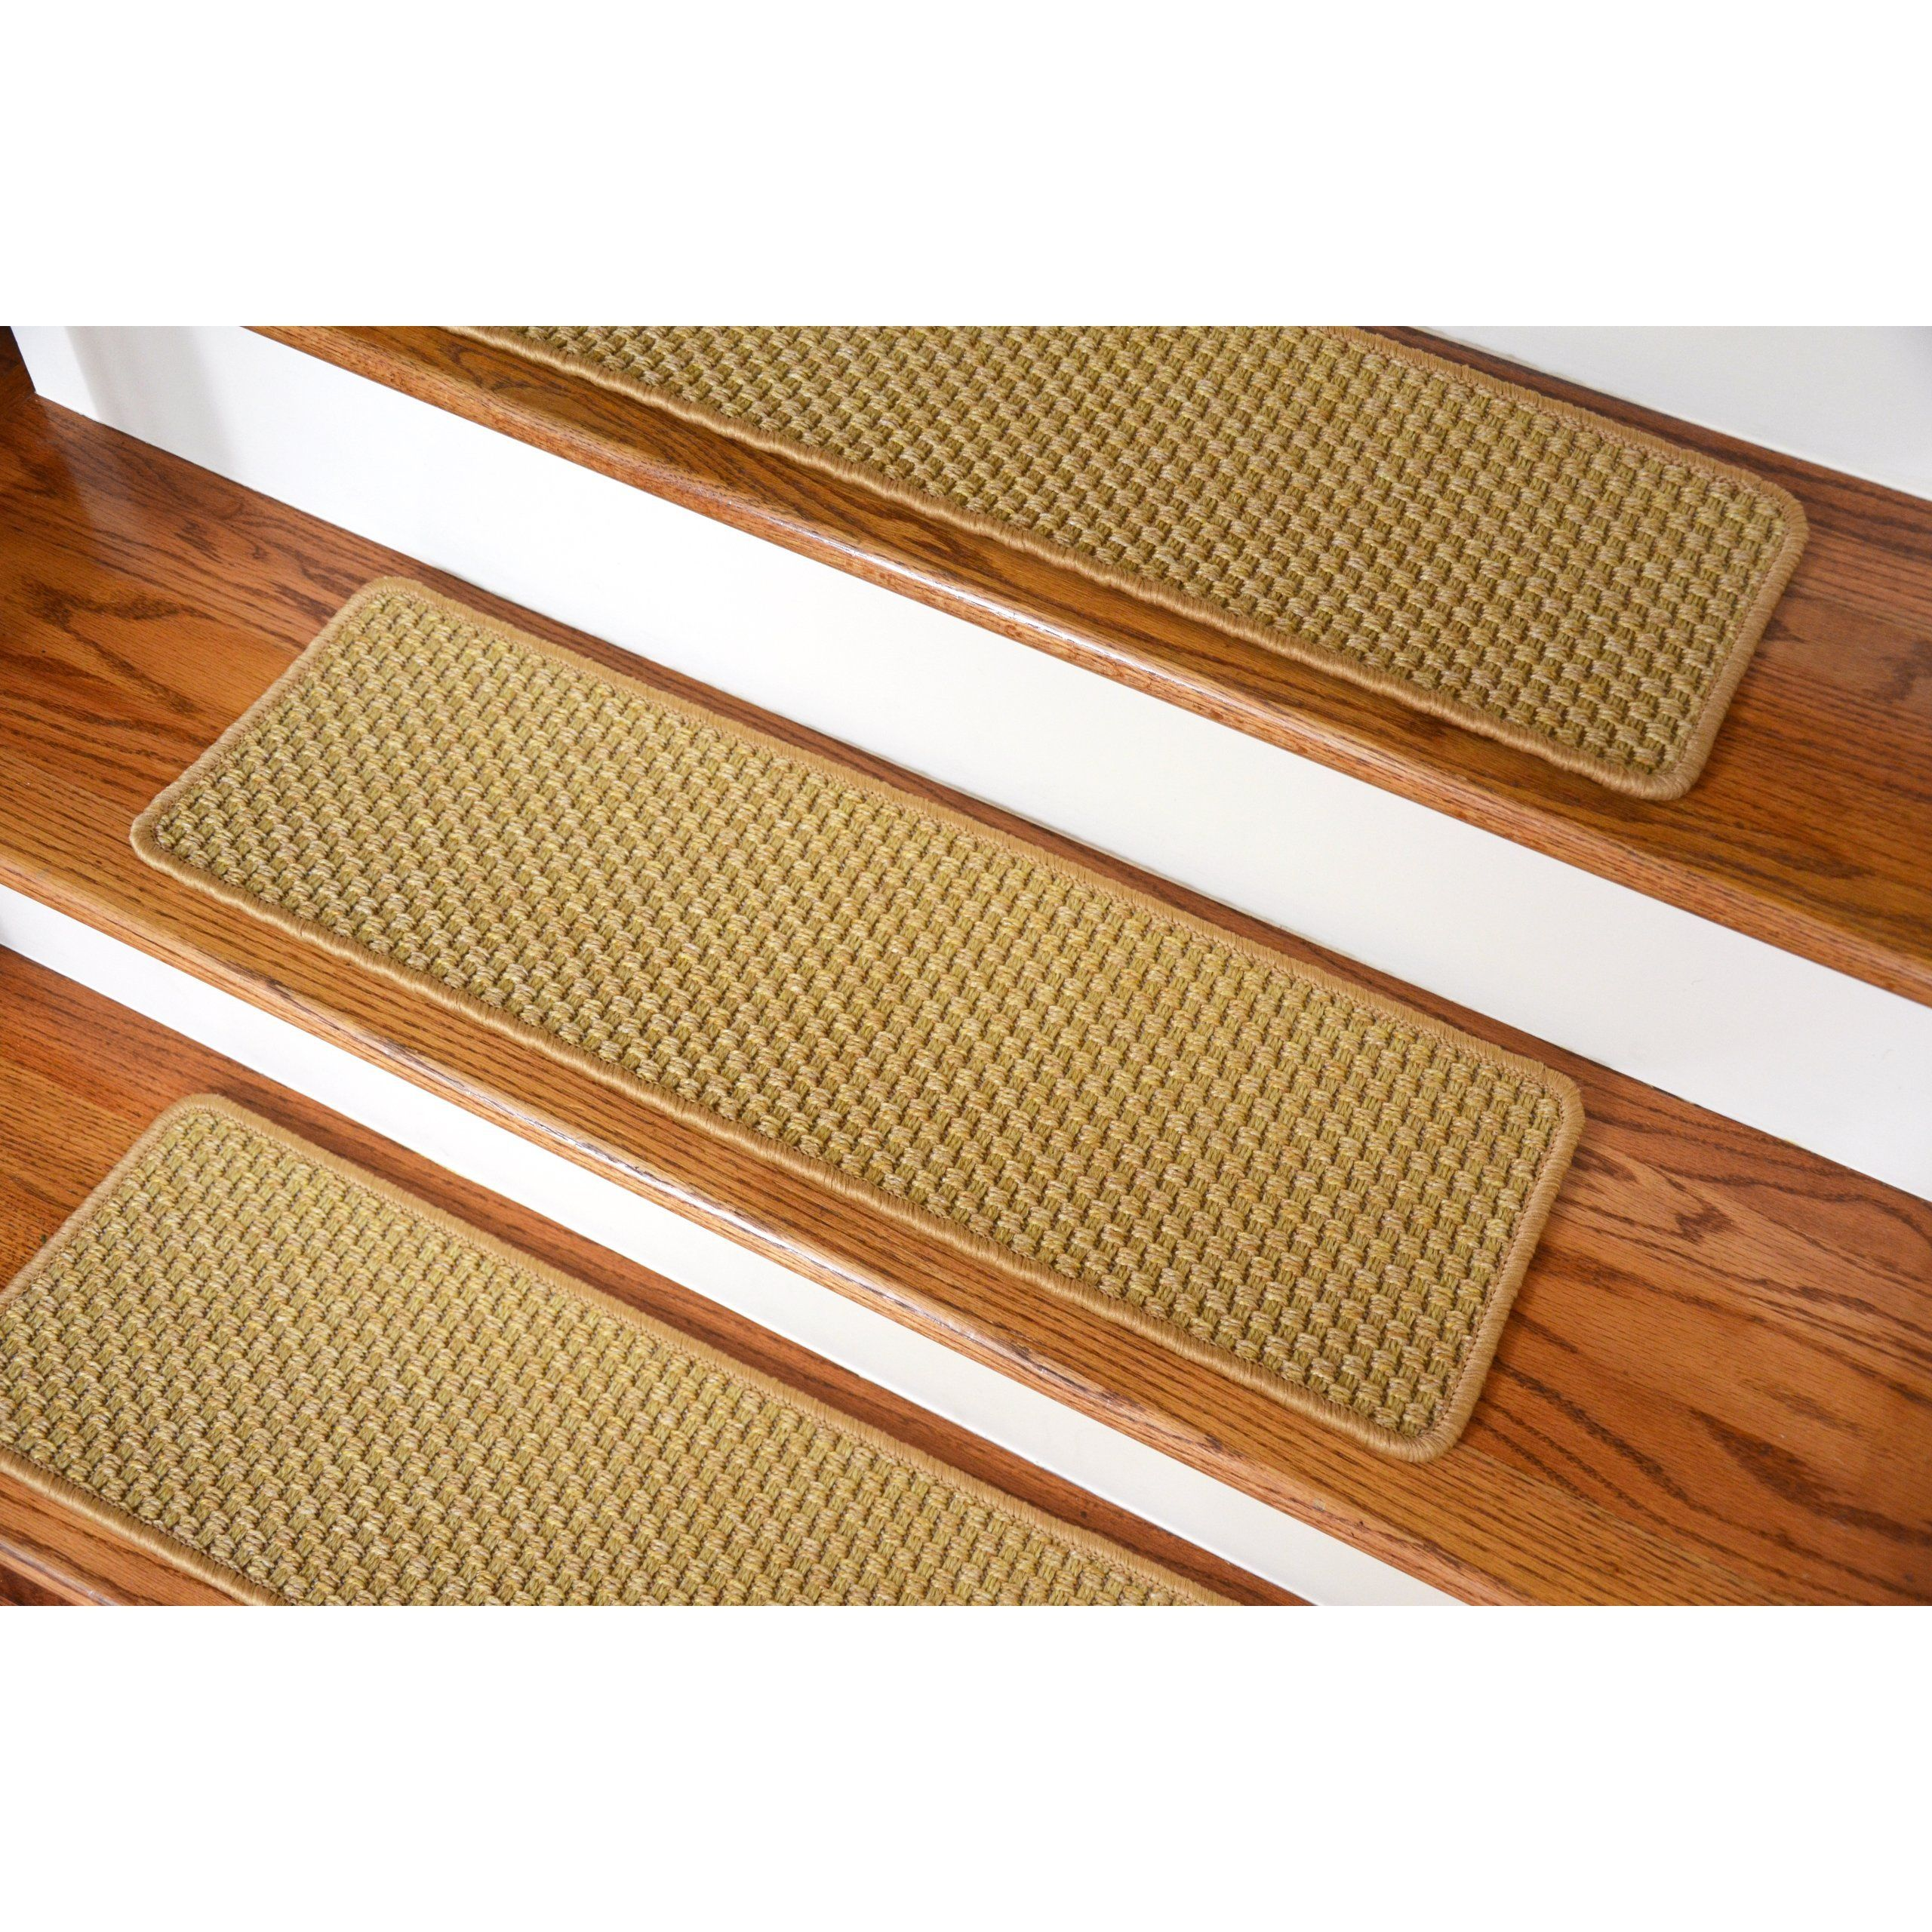 Dean Flooring Company Dean Indoor Outdoor Flatweave Carpet Stair | Dean Flooring Stair Treads | Fiber Sisal | Bullnose Wraparound | Stick Bullnose | Sisal Carpet | Washable Non